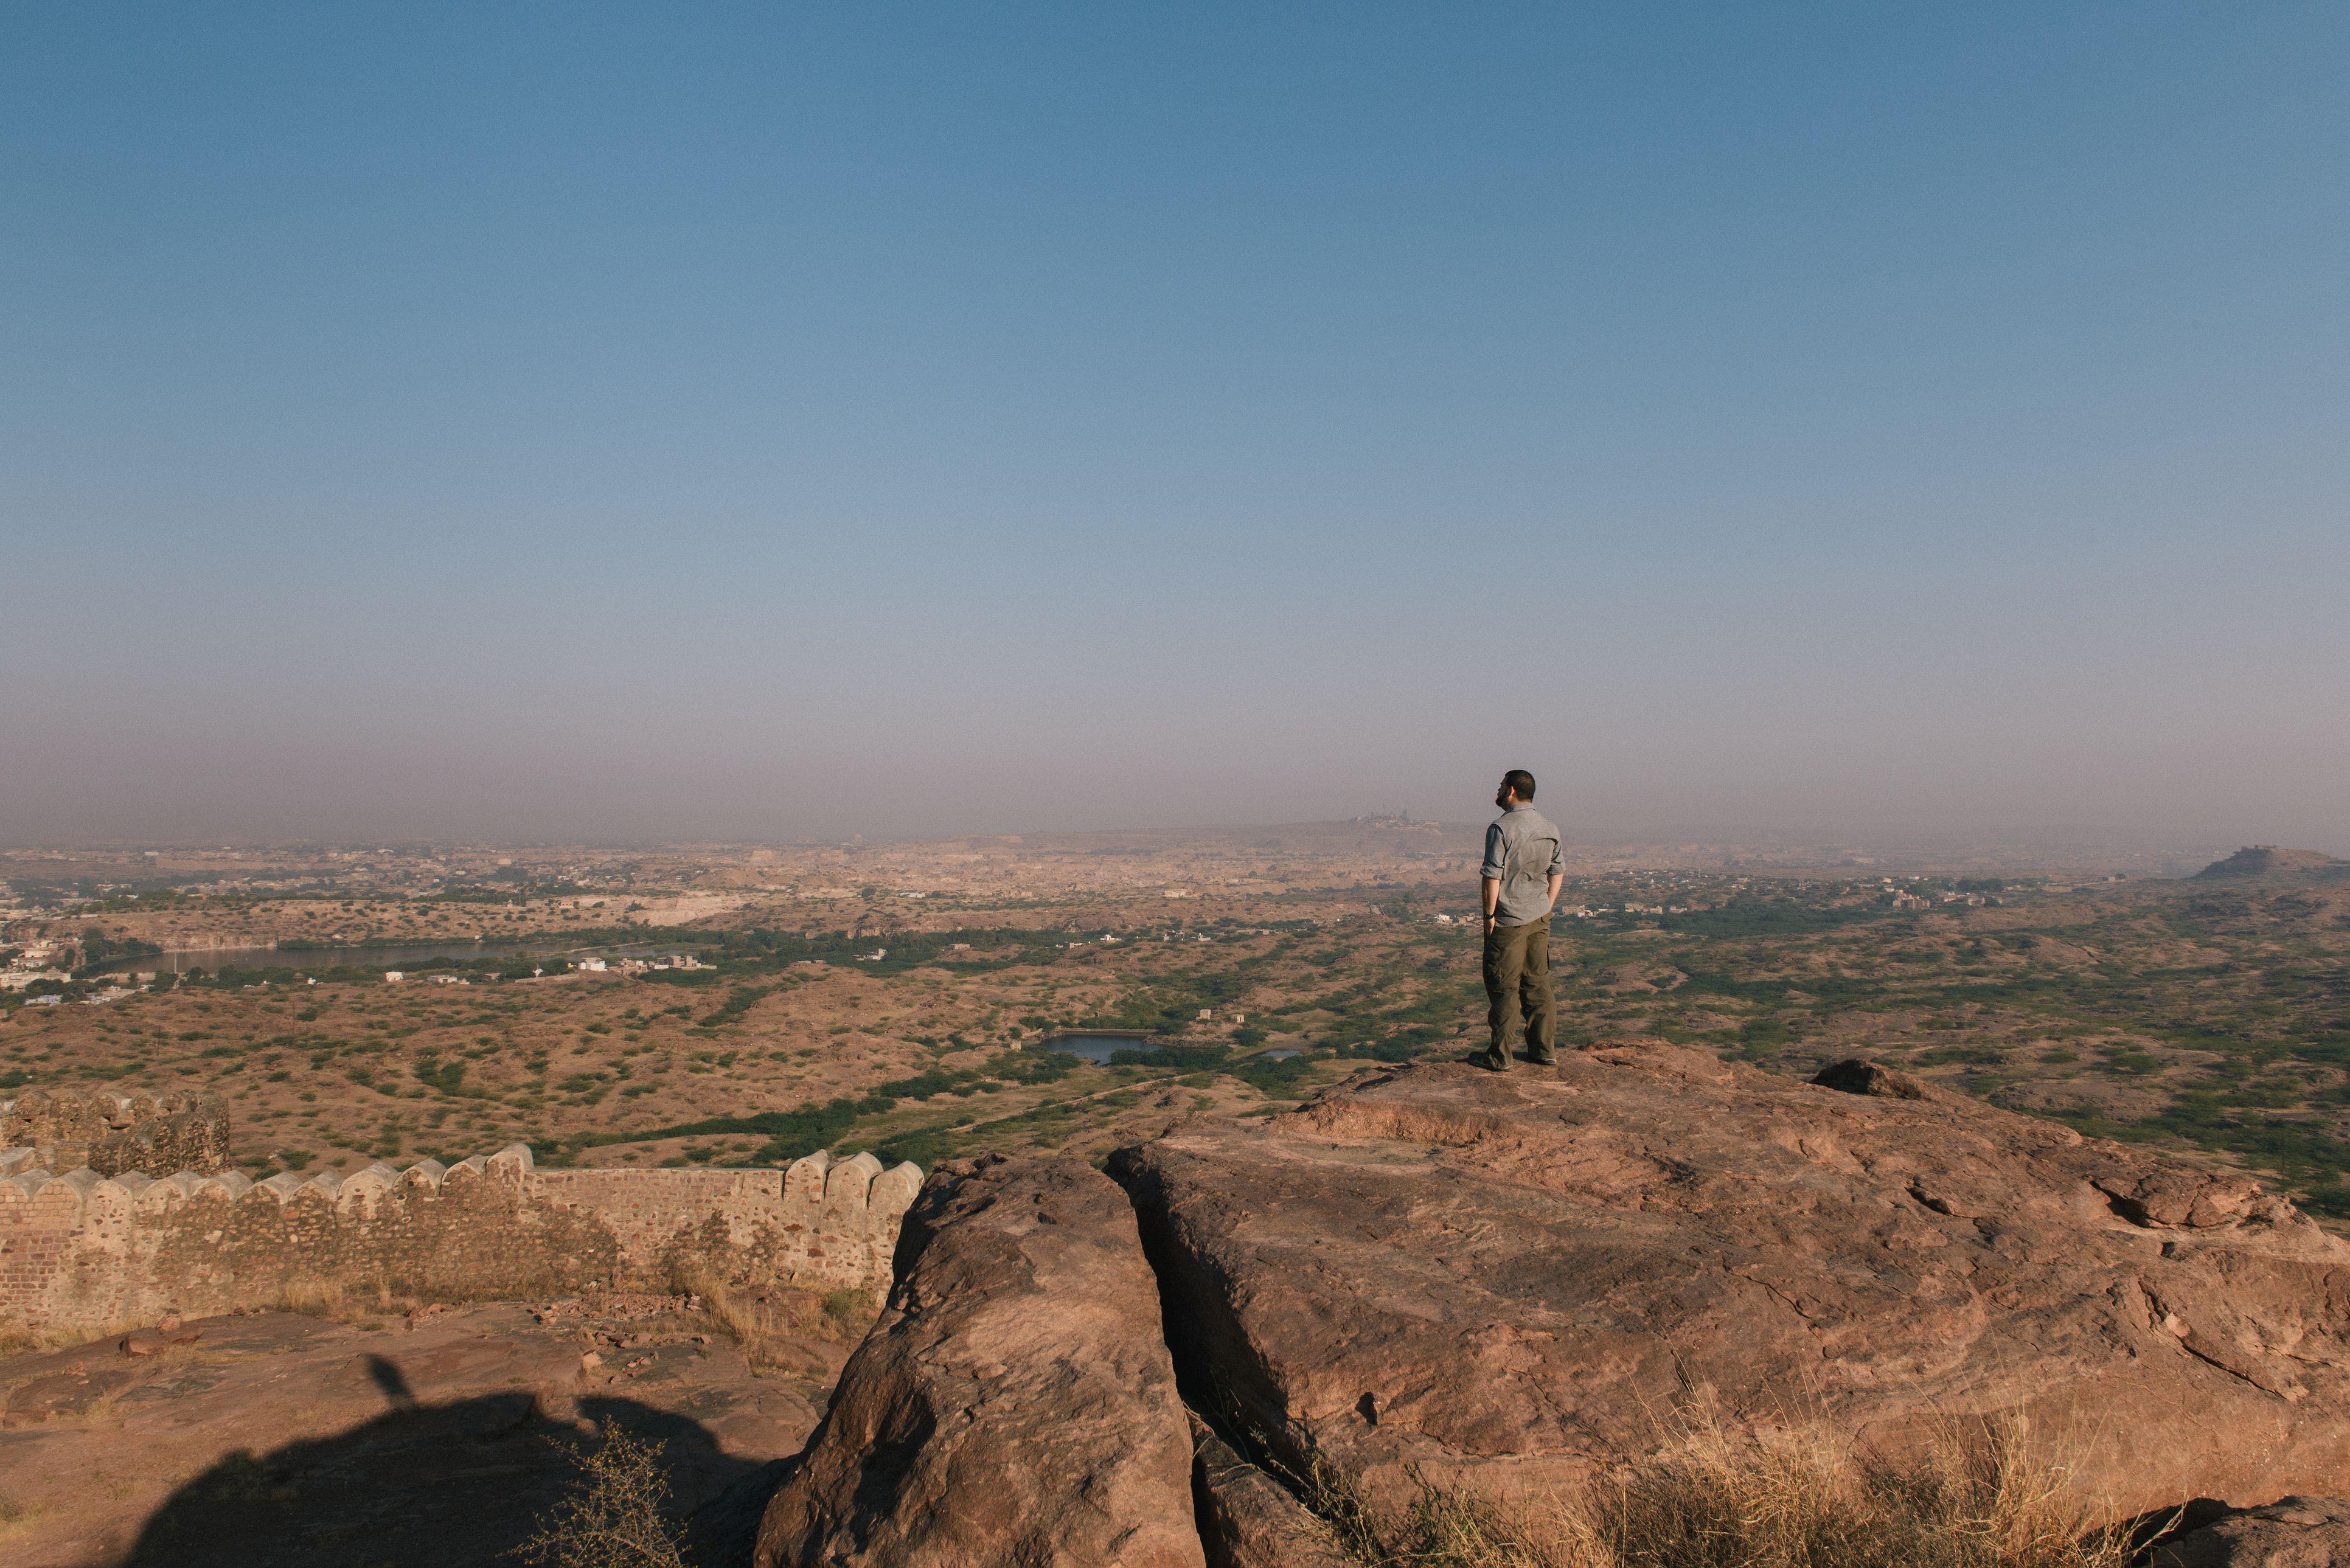 Man standing on rock in Rao Jodha Desert Rock Park, Jodhpur, Rajasthan, India